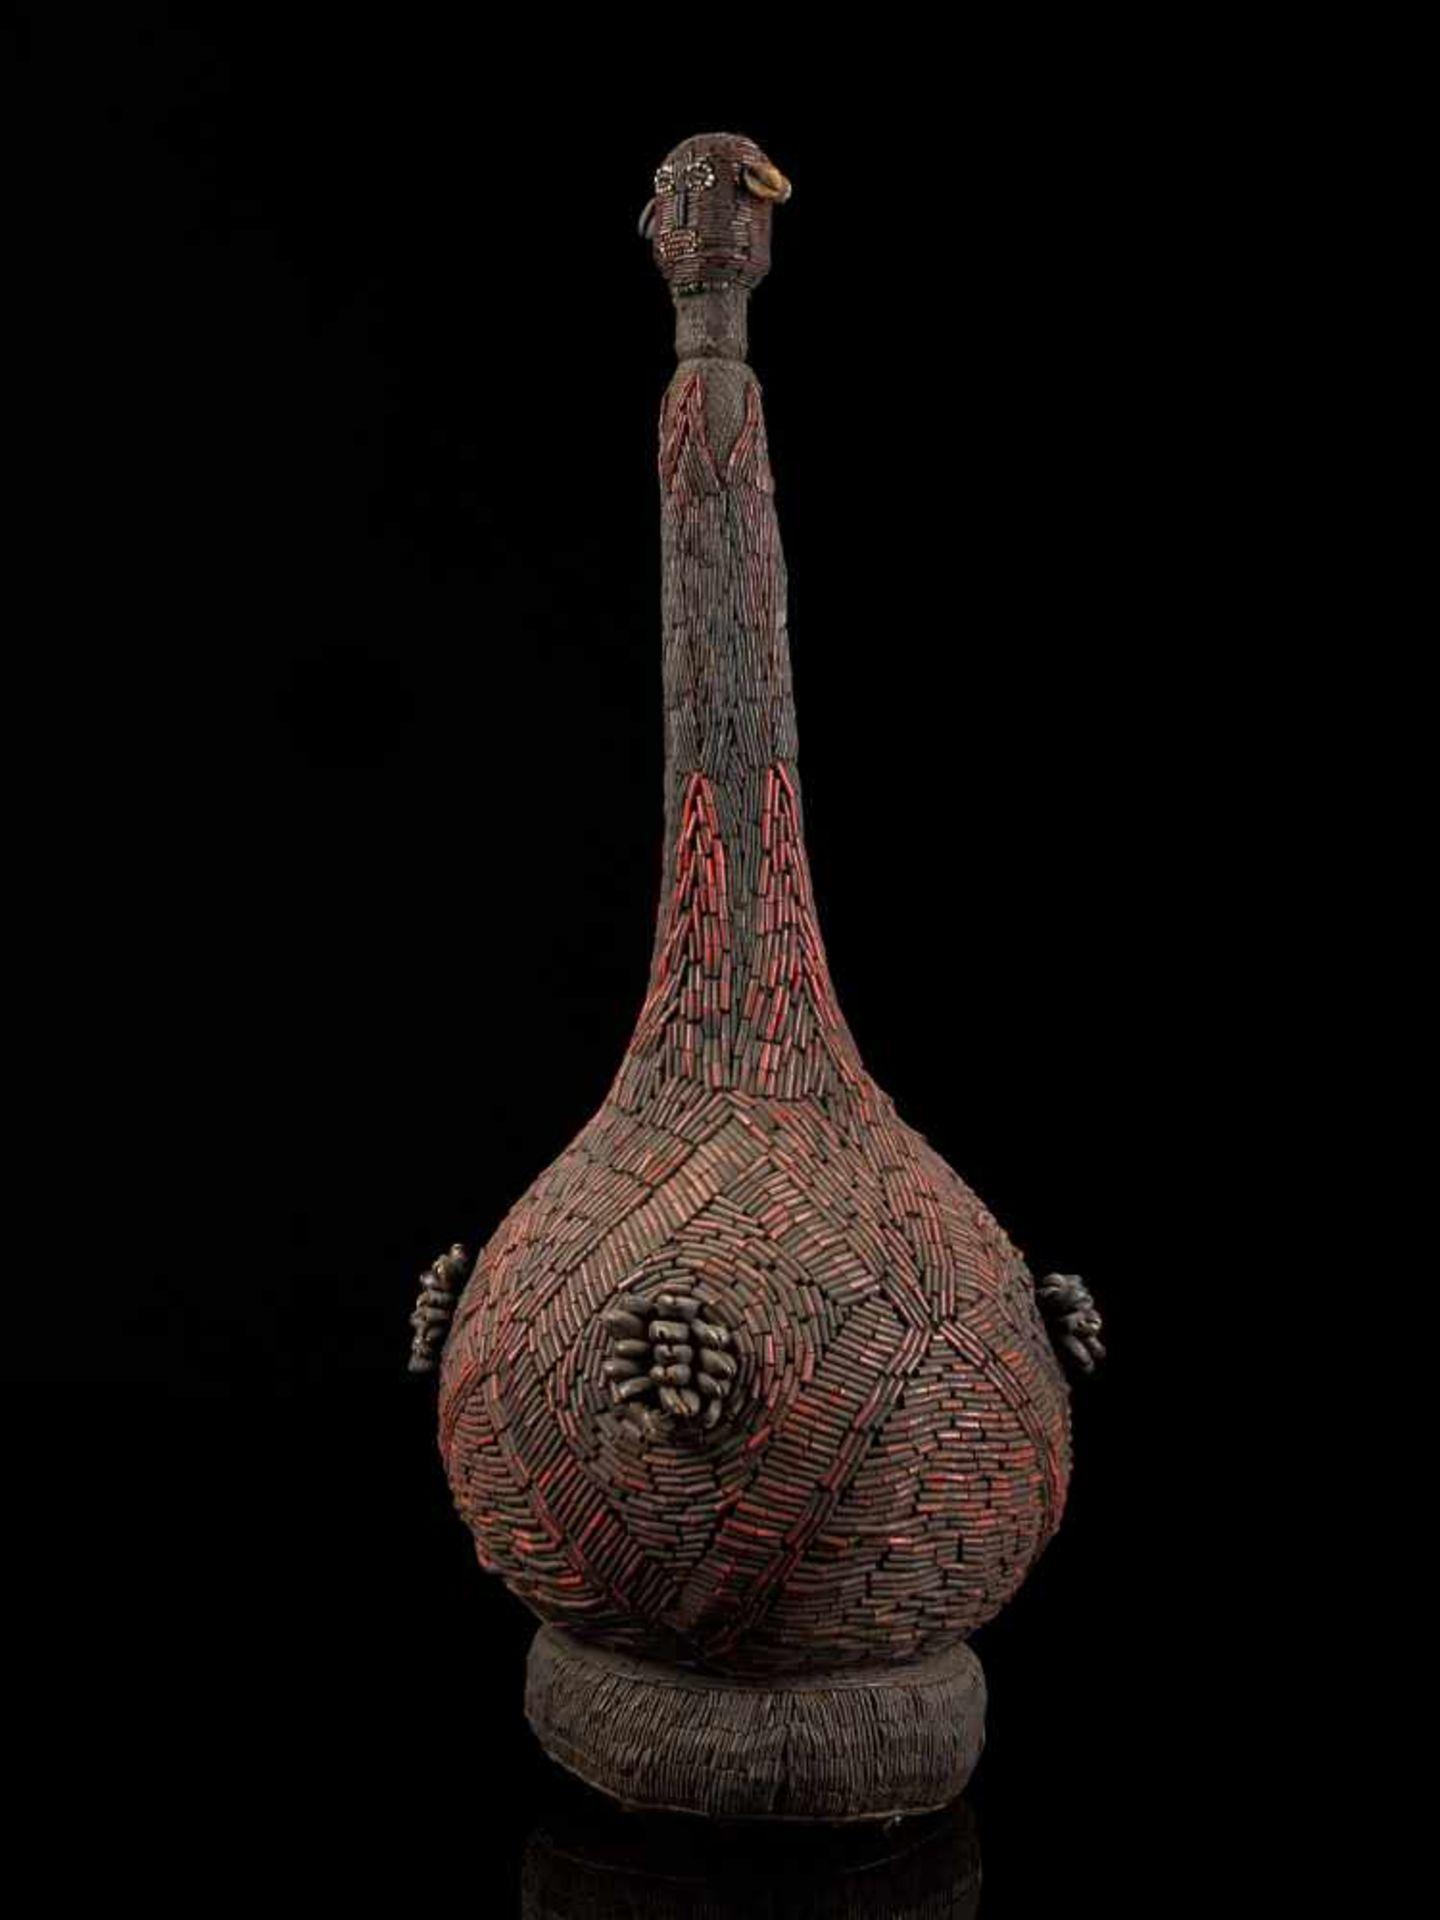 Beaded Palm Wine Vessel Topped With Human Figure - Tribal ArtThis impressive beaded wine vessel is - Bild 2 aus 8